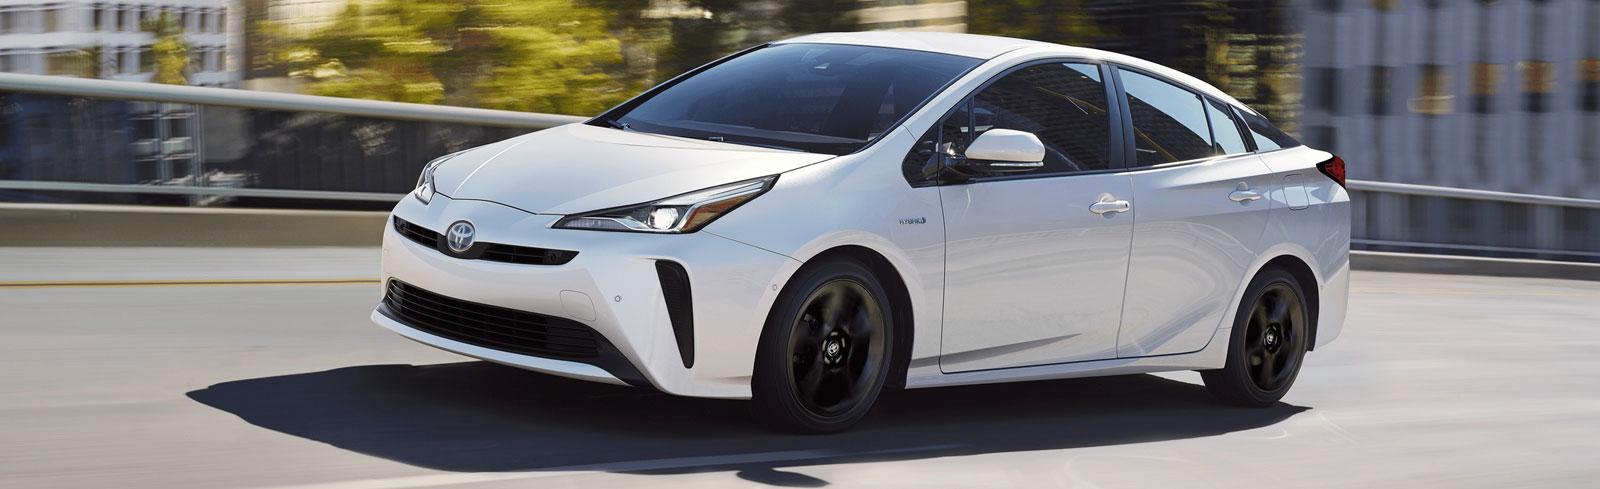 2020 Toyota Prius Hybrid for Sale in Oklahoma City, Oklahoma